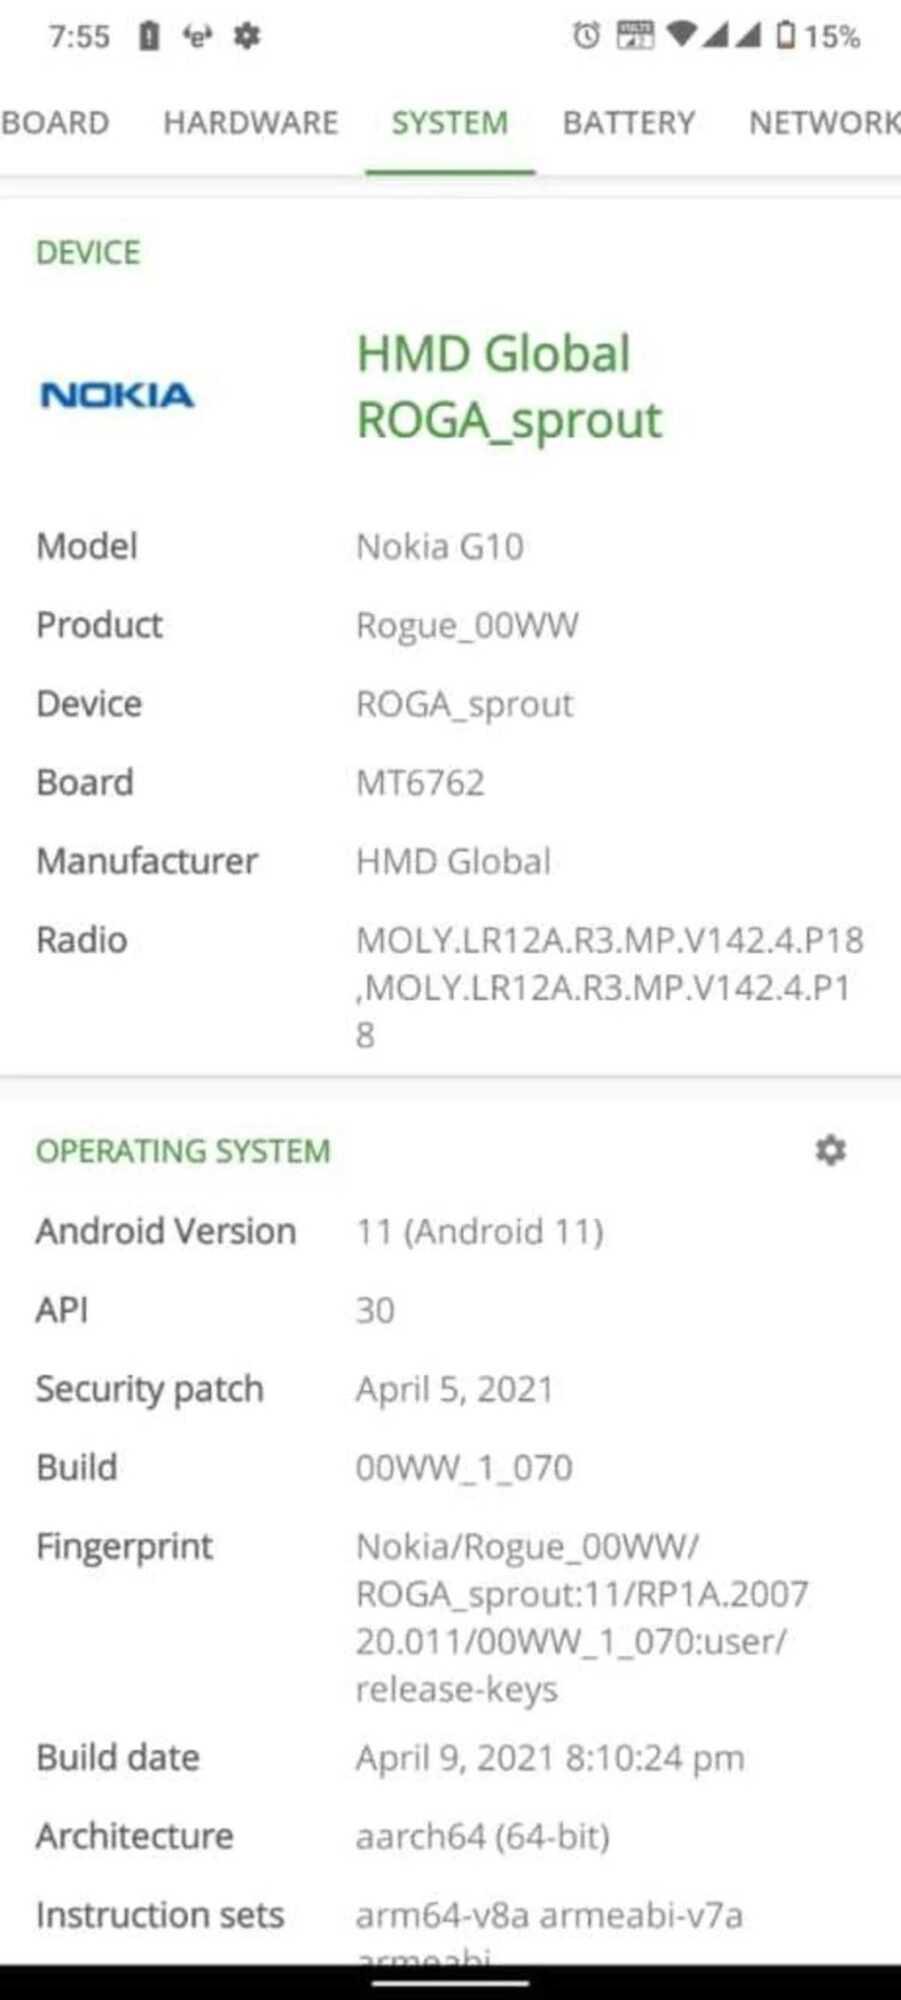 Nokia G10 Rogue